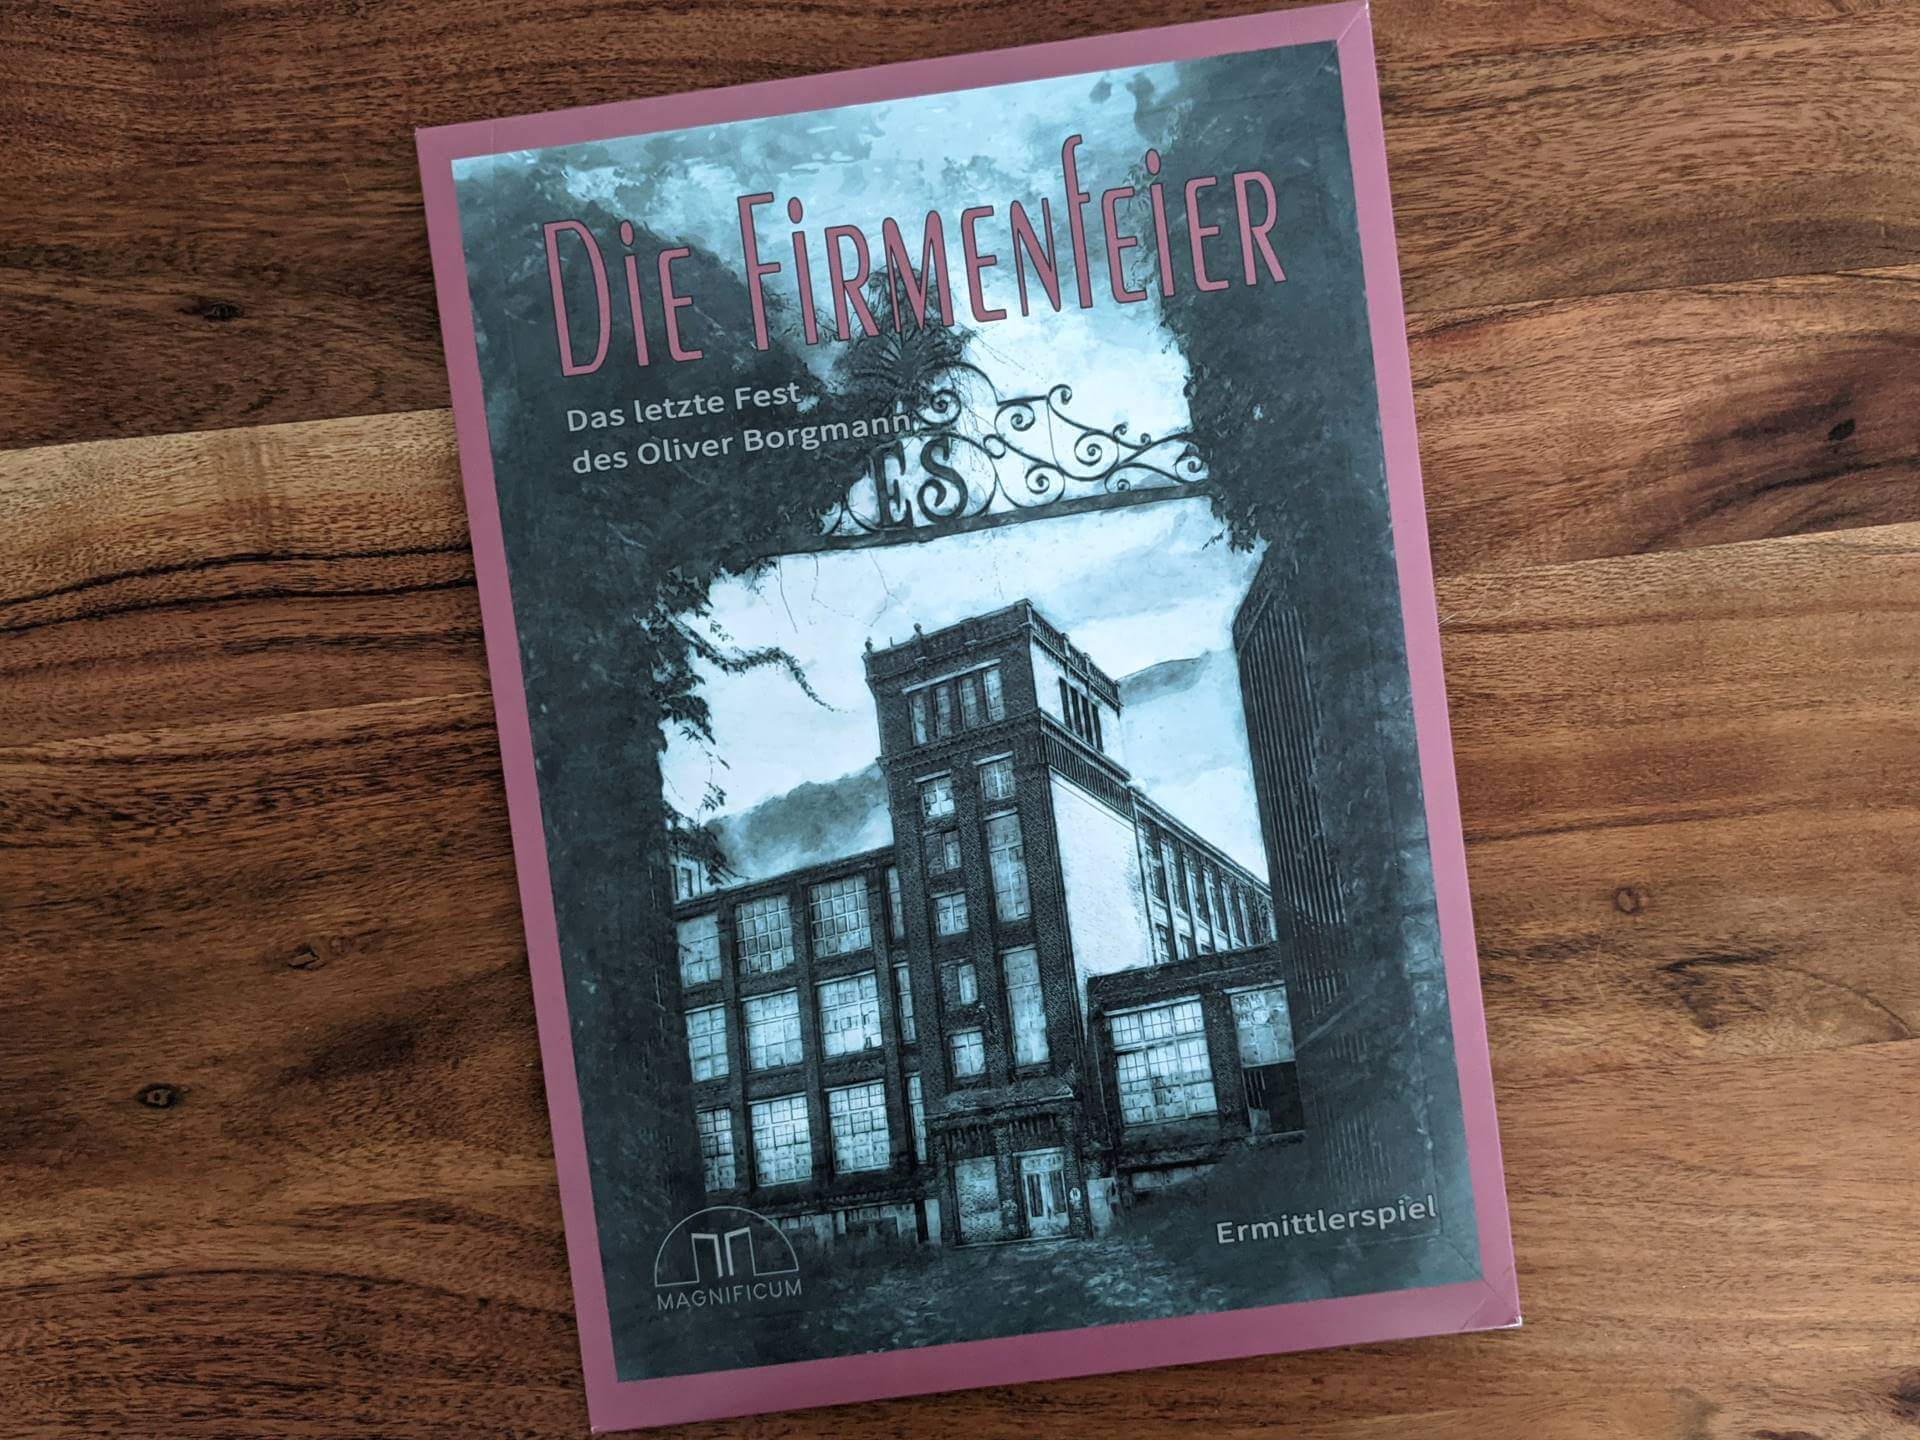 Die Firmenfeier - Das letzte Fest des Oliver Borgmann Review